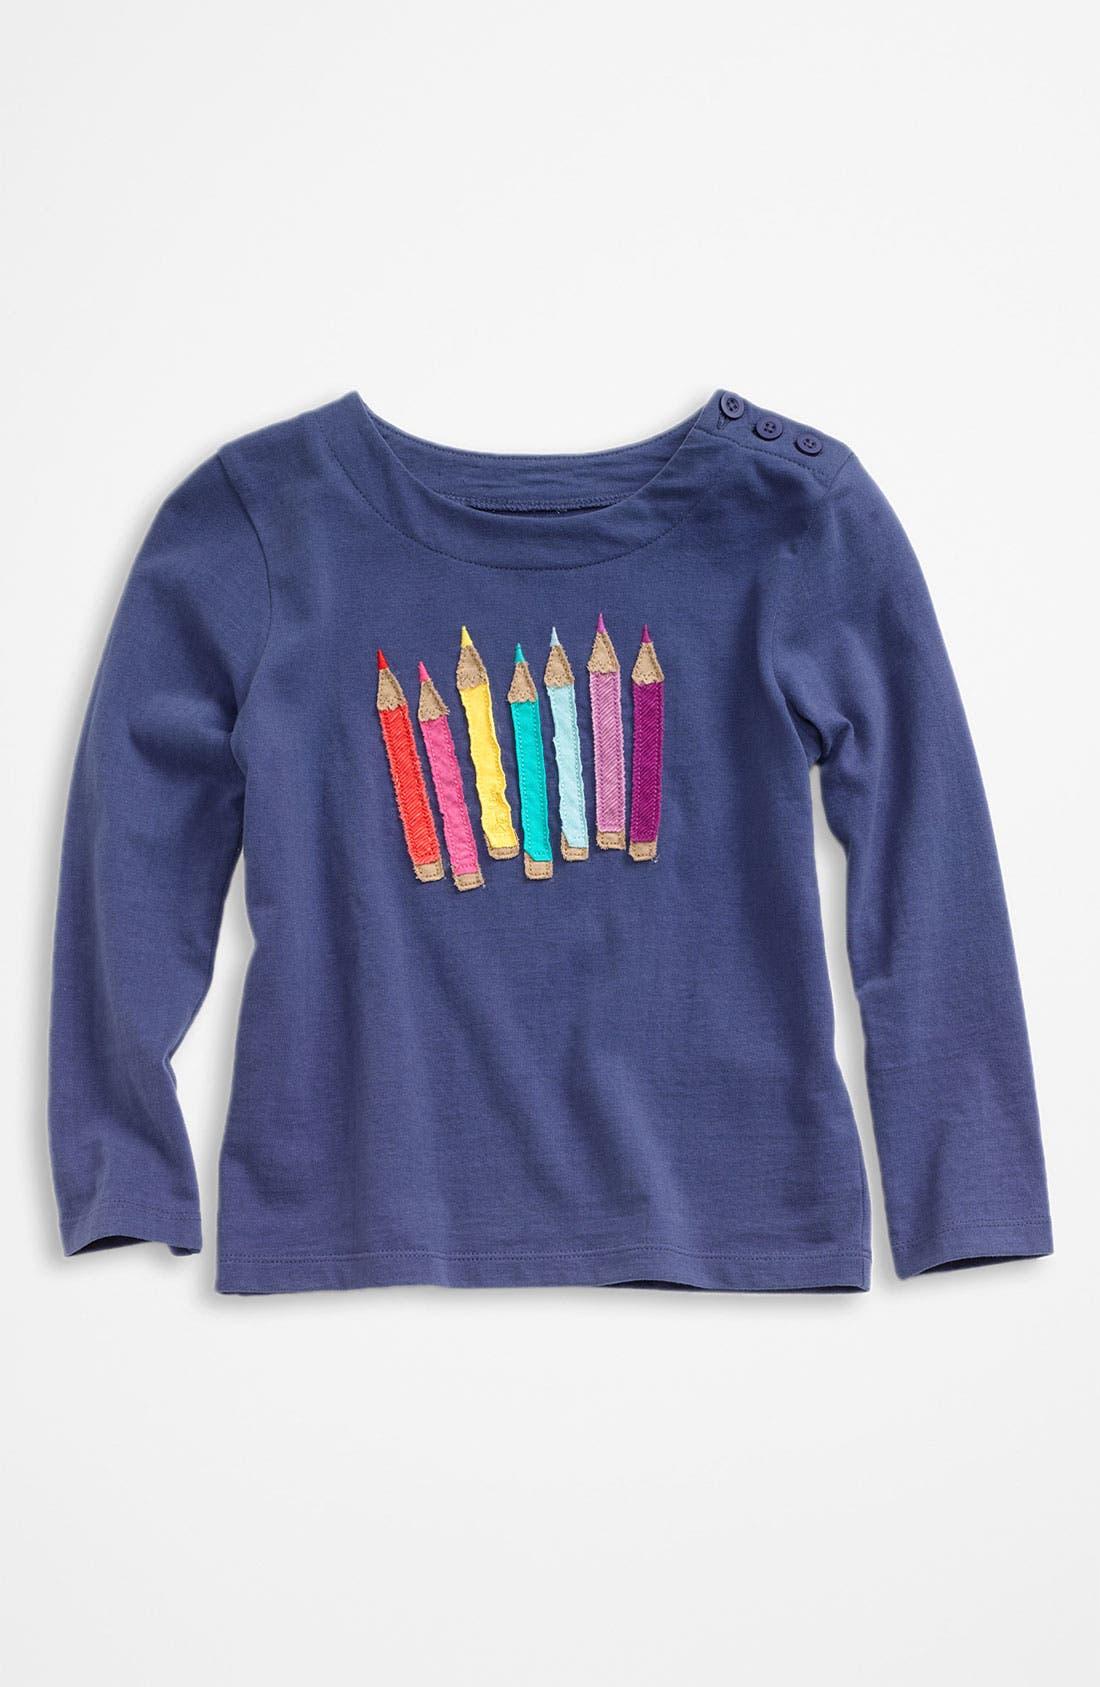 Alternate Image 1 Selected - Mini Boden 'Multi Crayon' Appliqué Tee (Toddler)